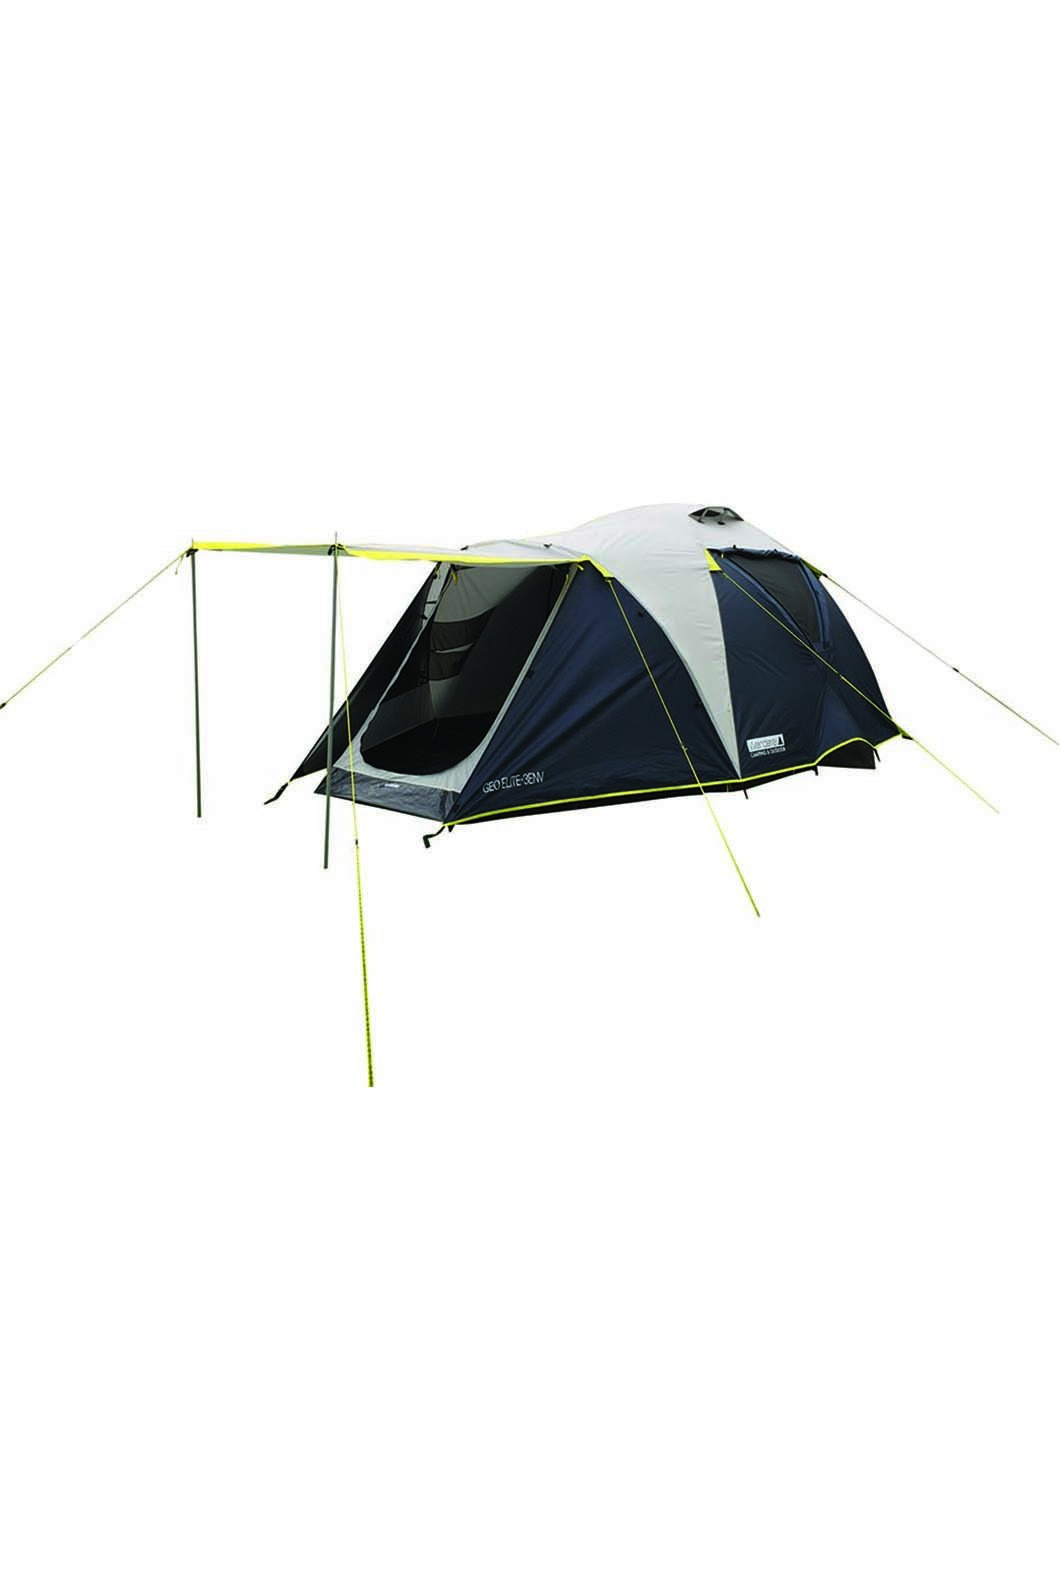 Wanderer Geo Elite 3ENV 3 Person Dome Tent, None, hi-res